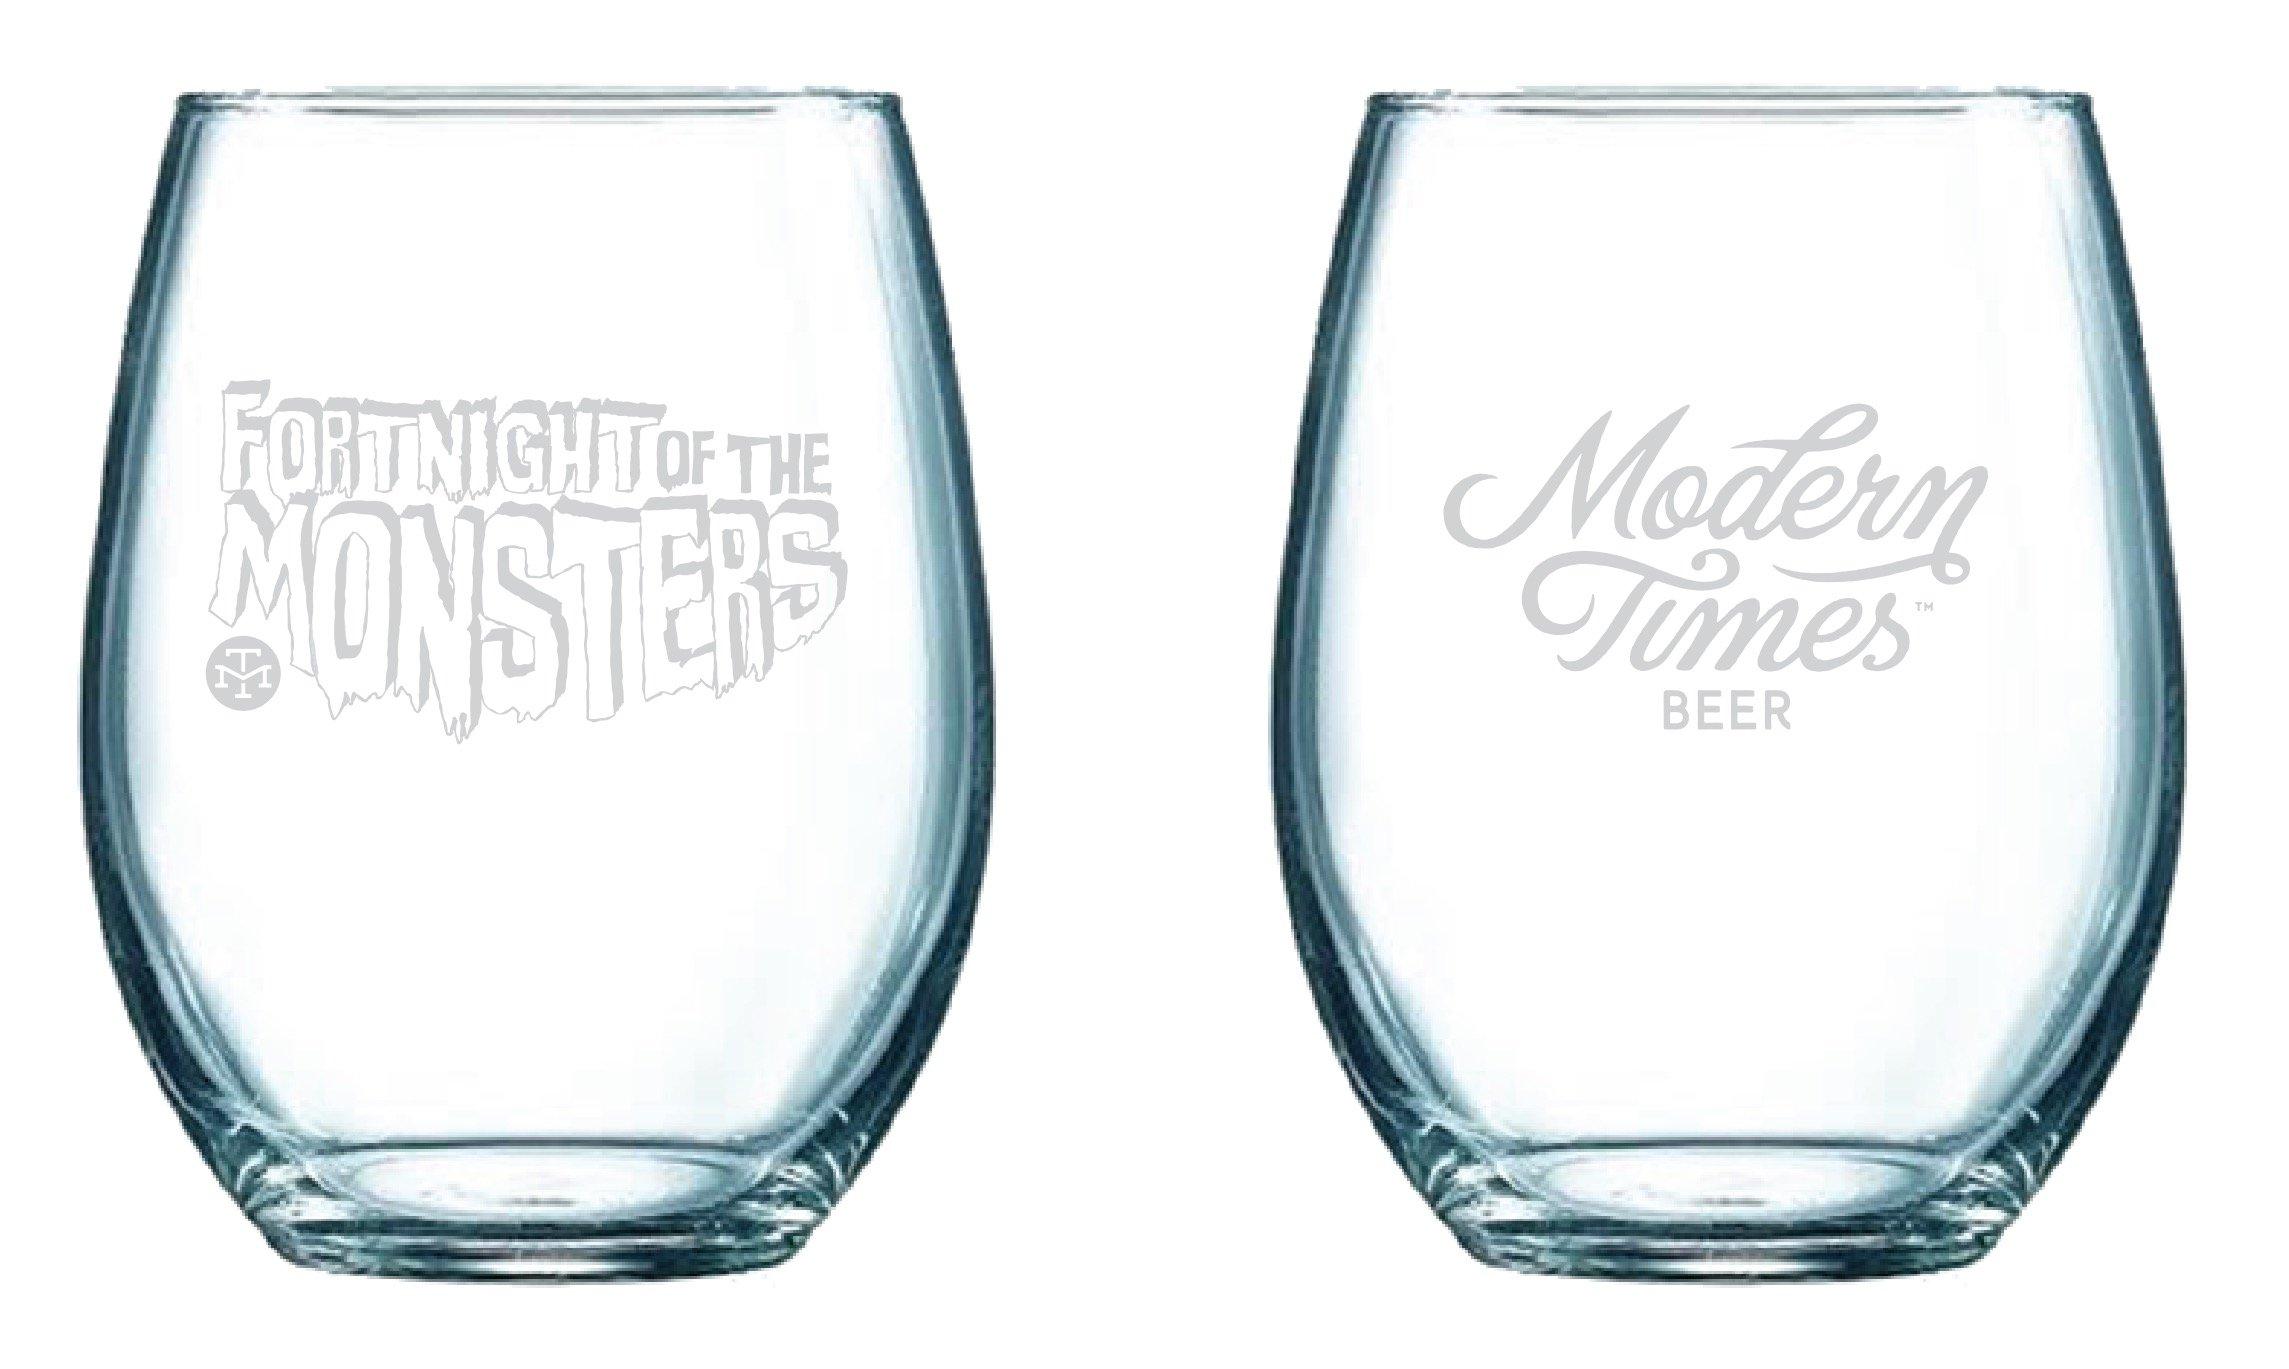 Fortnight of the Monsters 2016 Glasses